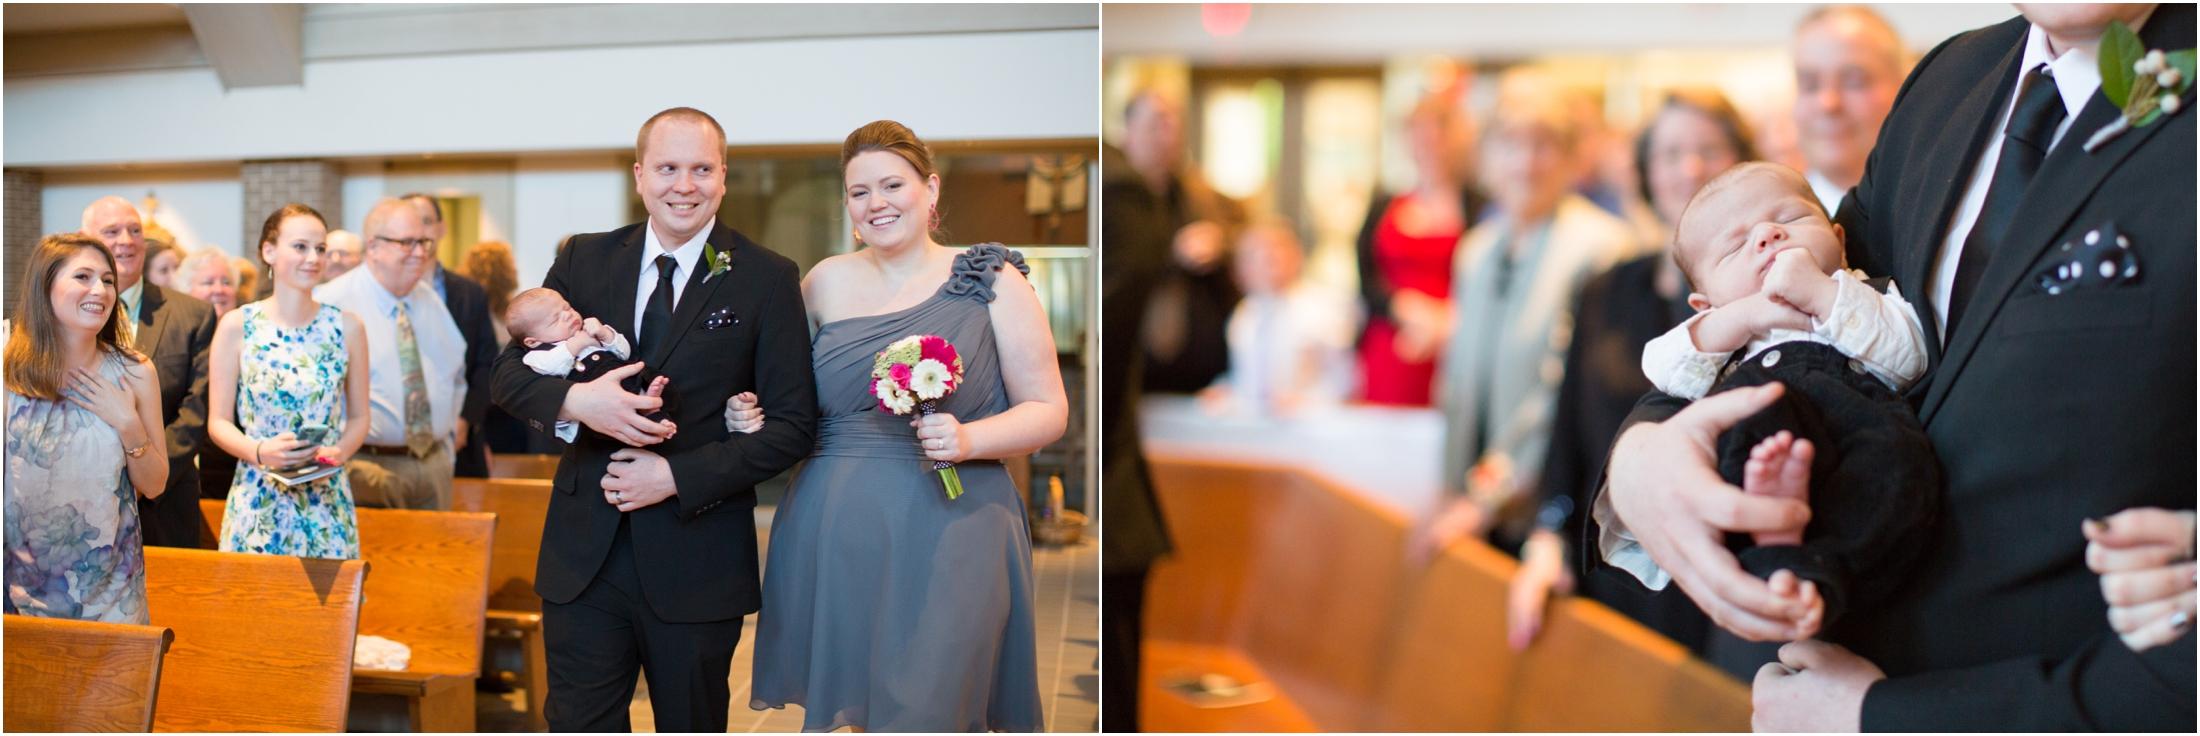 4-Lambert-Wedding-Ceremony-838.jpg